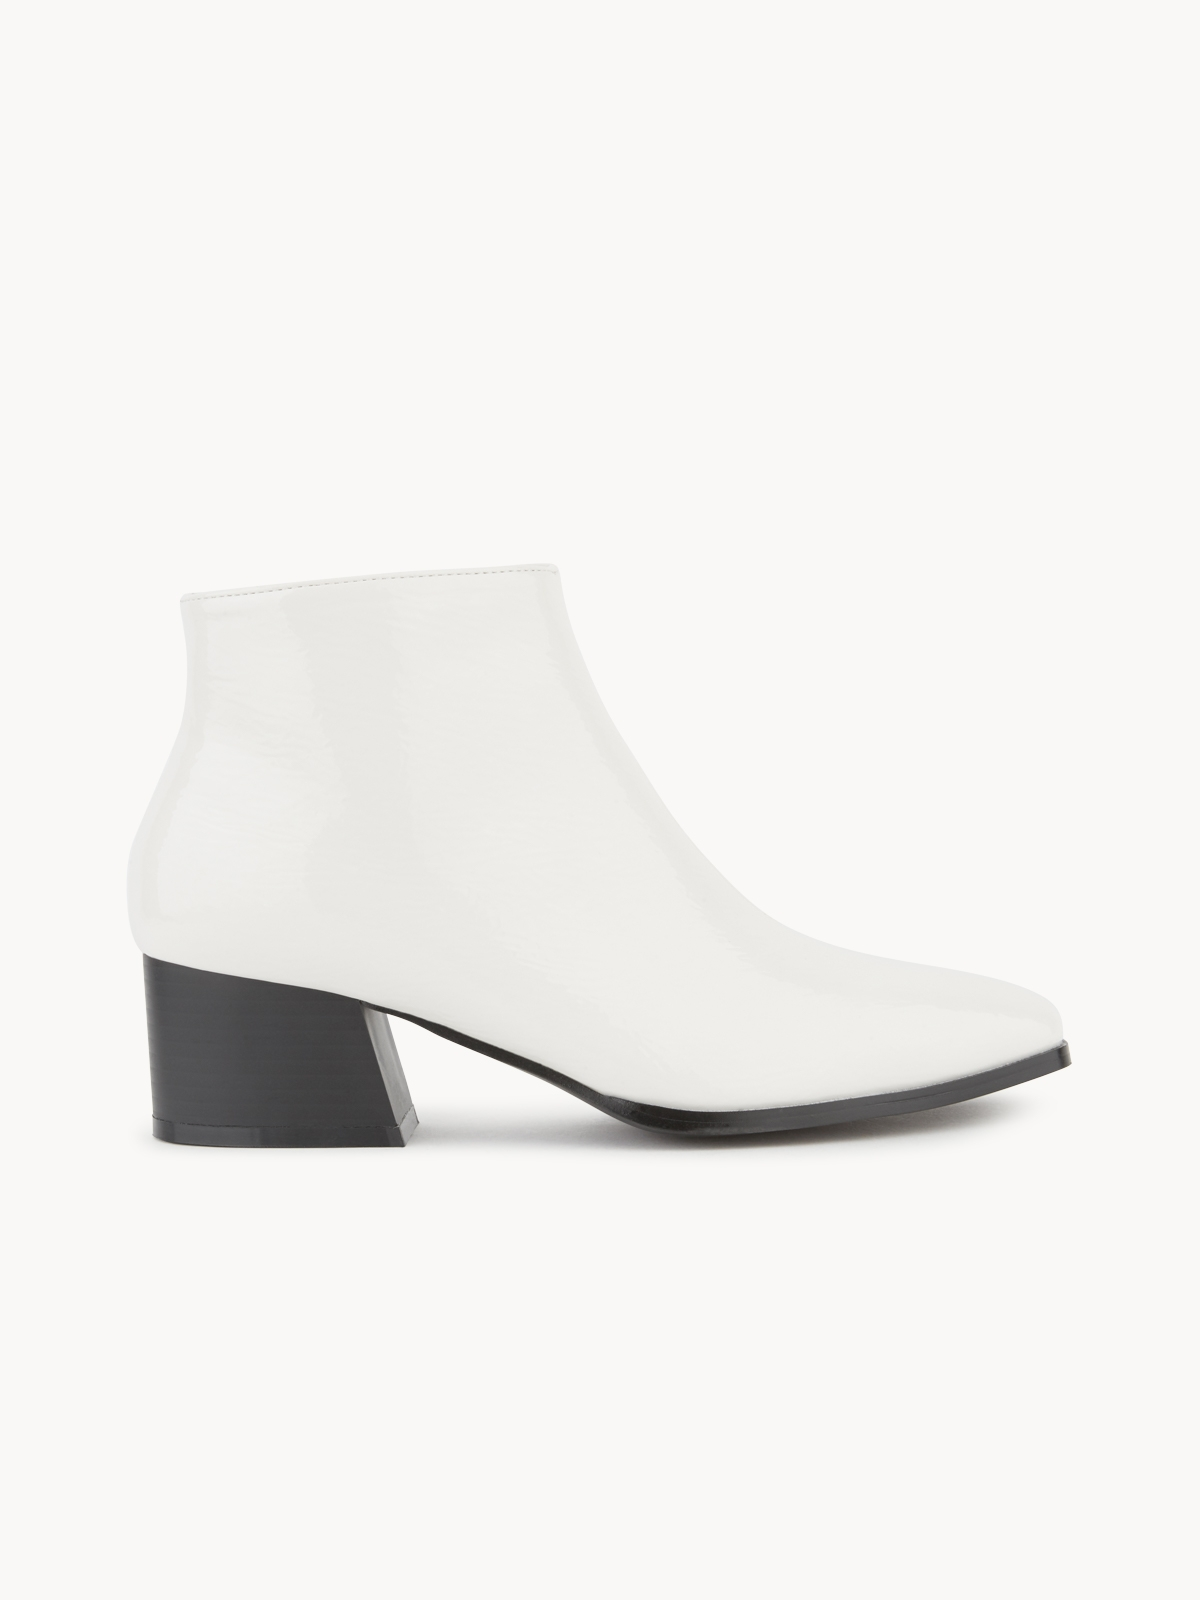 Starkela Classic Mid Round Boots White